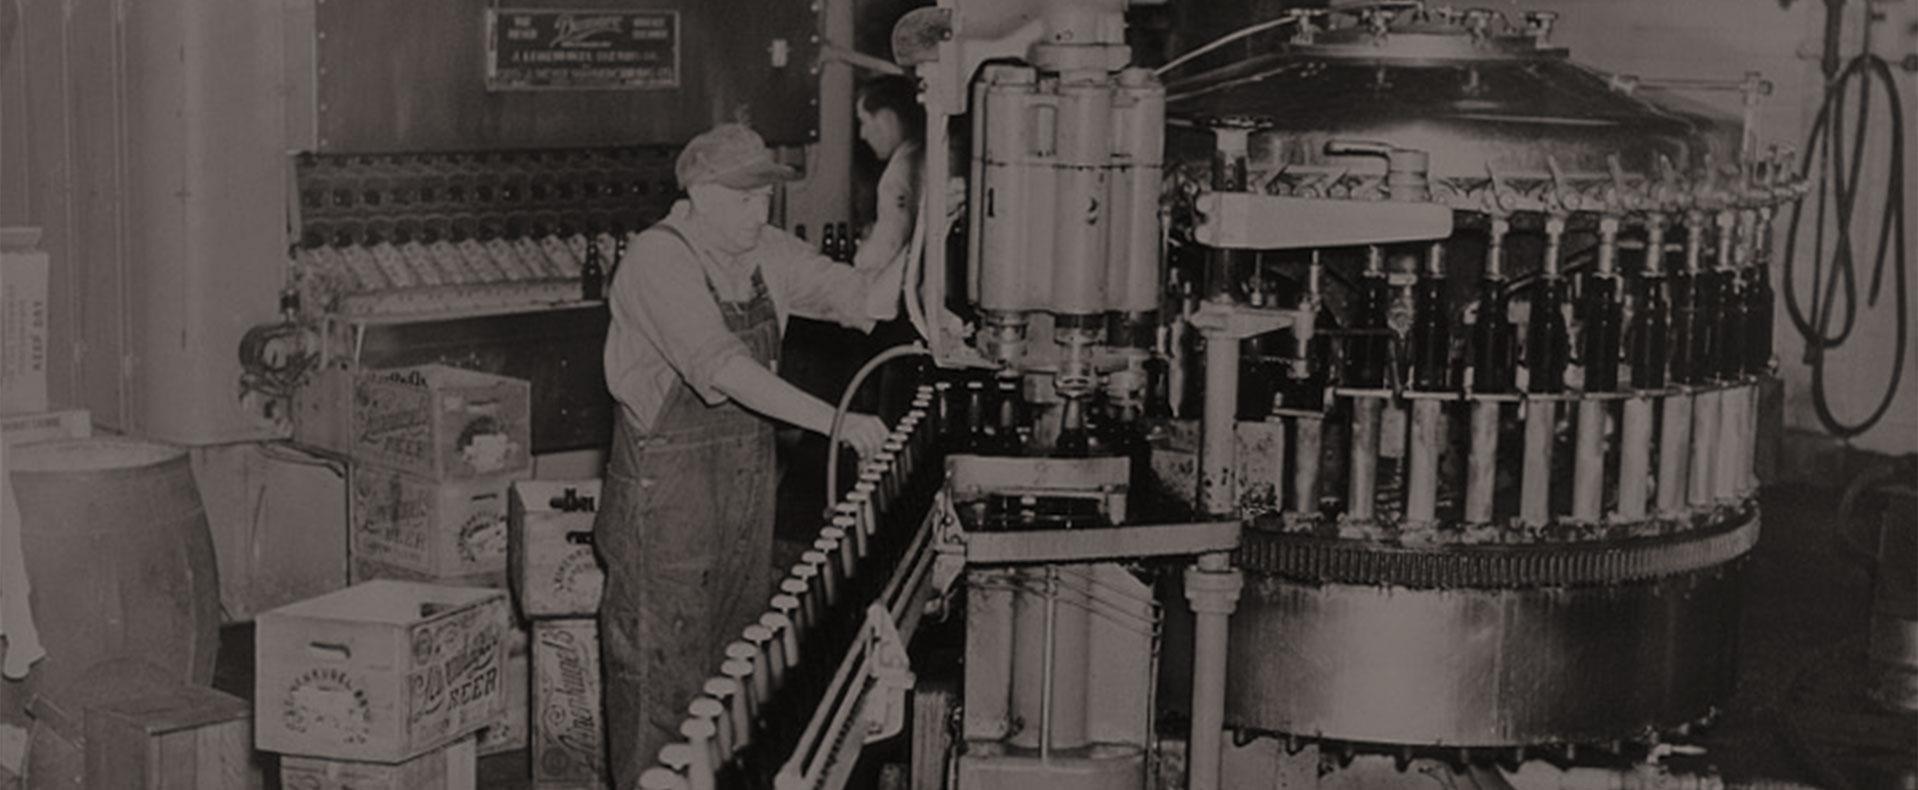 second generation leinenkugel